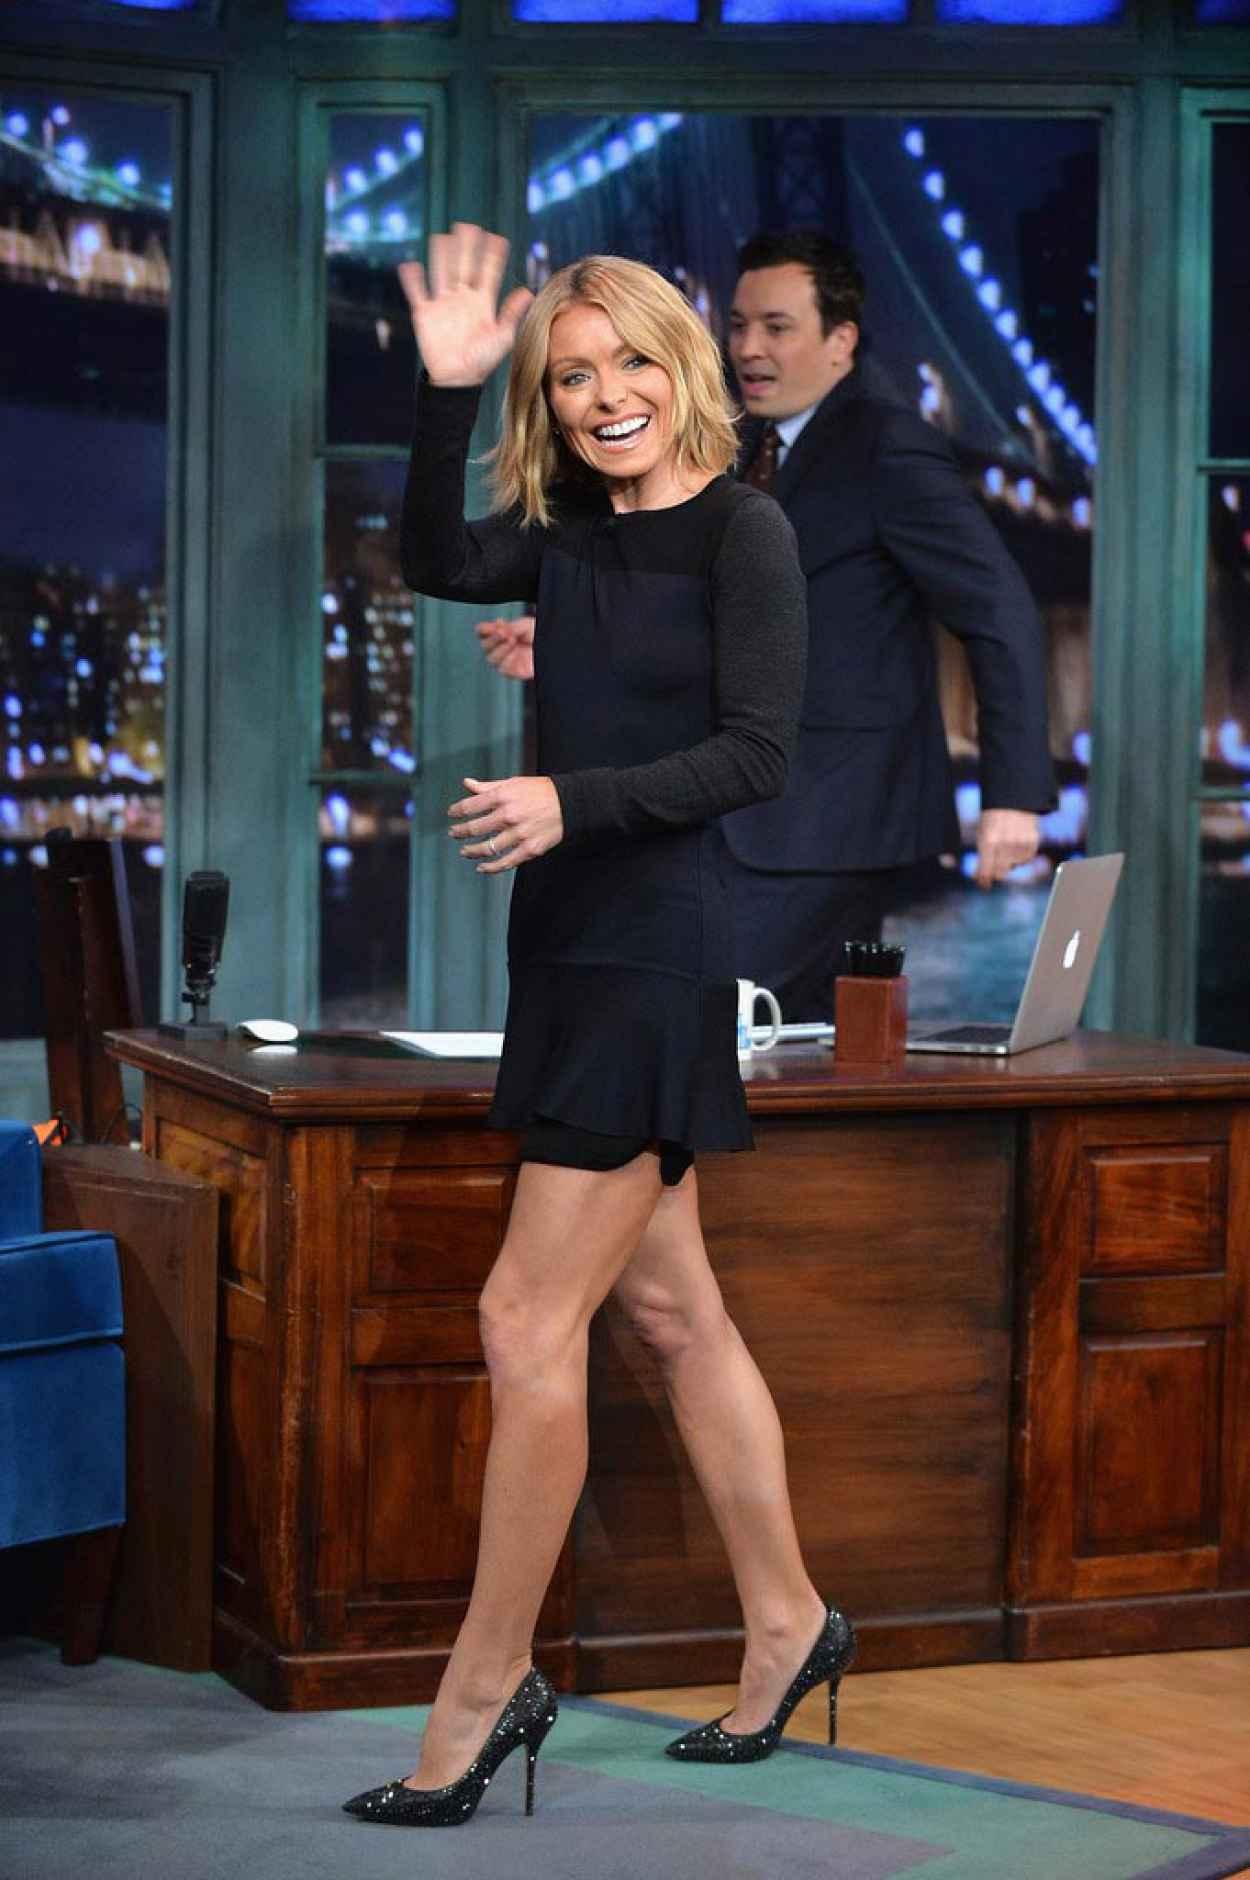 Kelly Ripa Visits Late Night with Jimmy Fallon - Twerking & Dancing GIFs-1